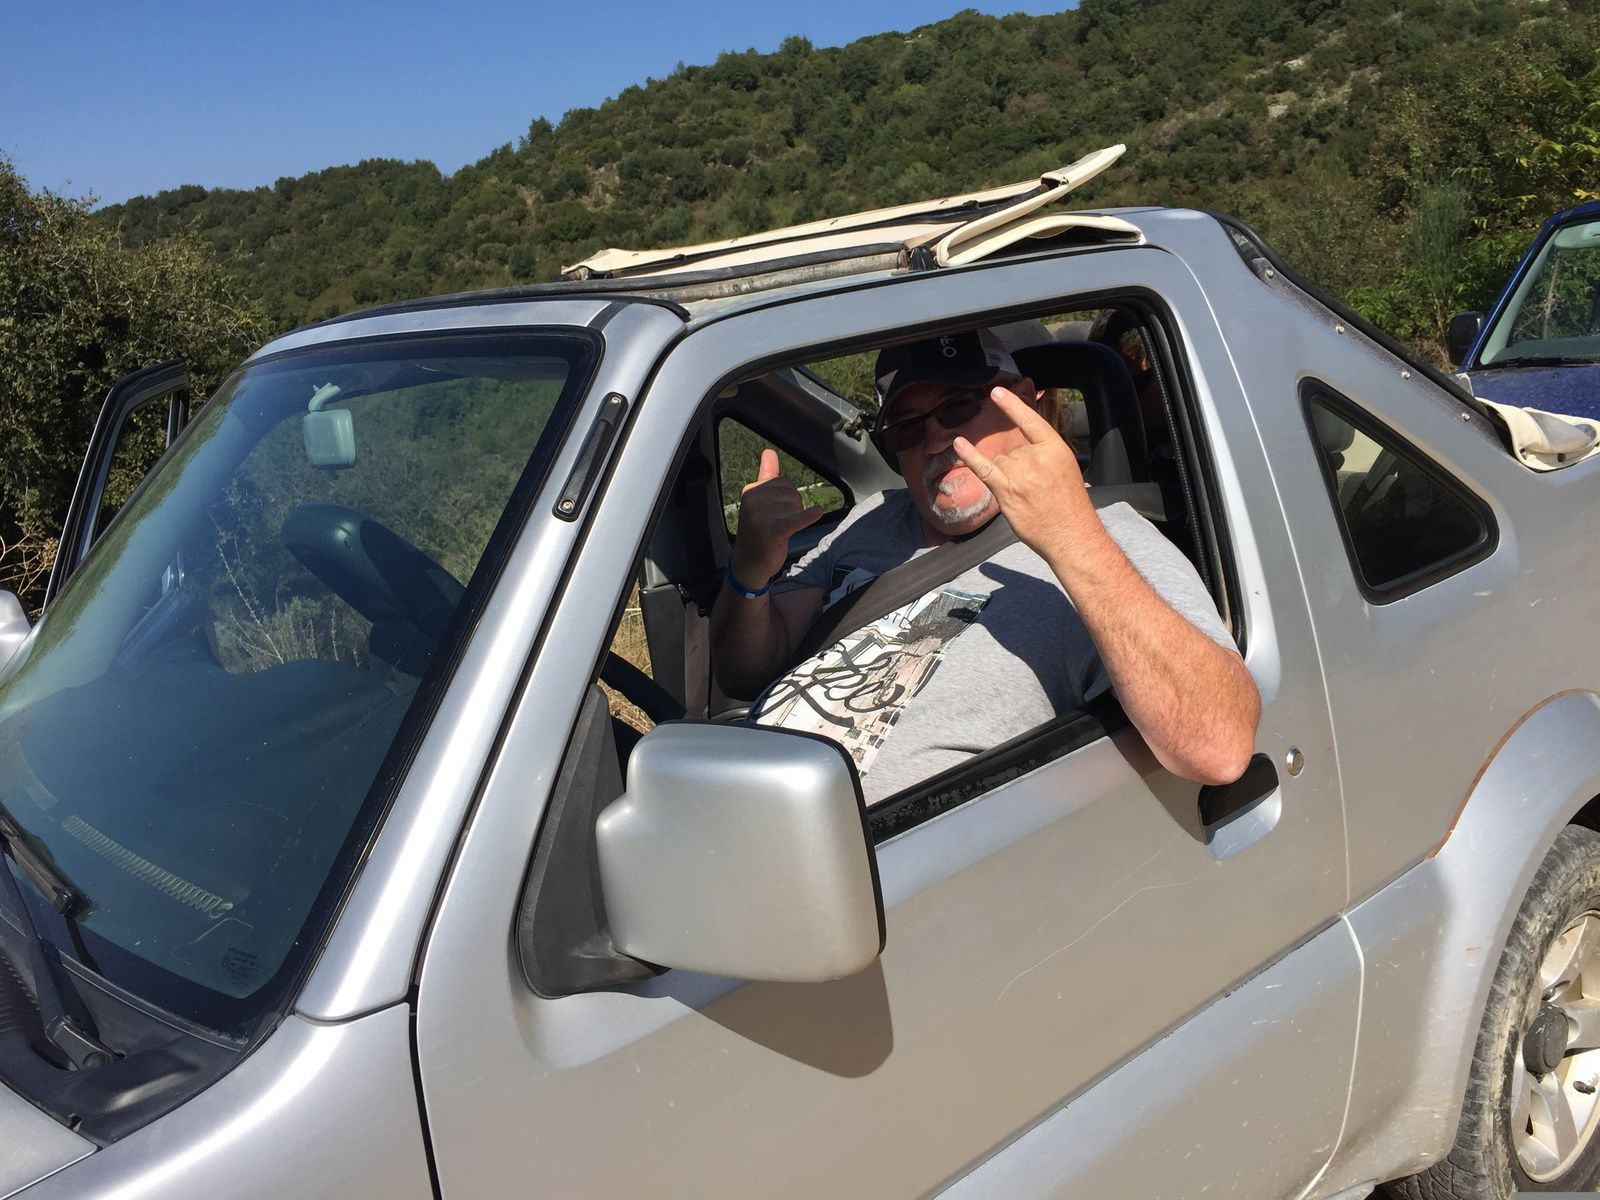 ALBUM PHOTO ET VIDEO DU VOYAGE EN GRECE A CORFU 2016